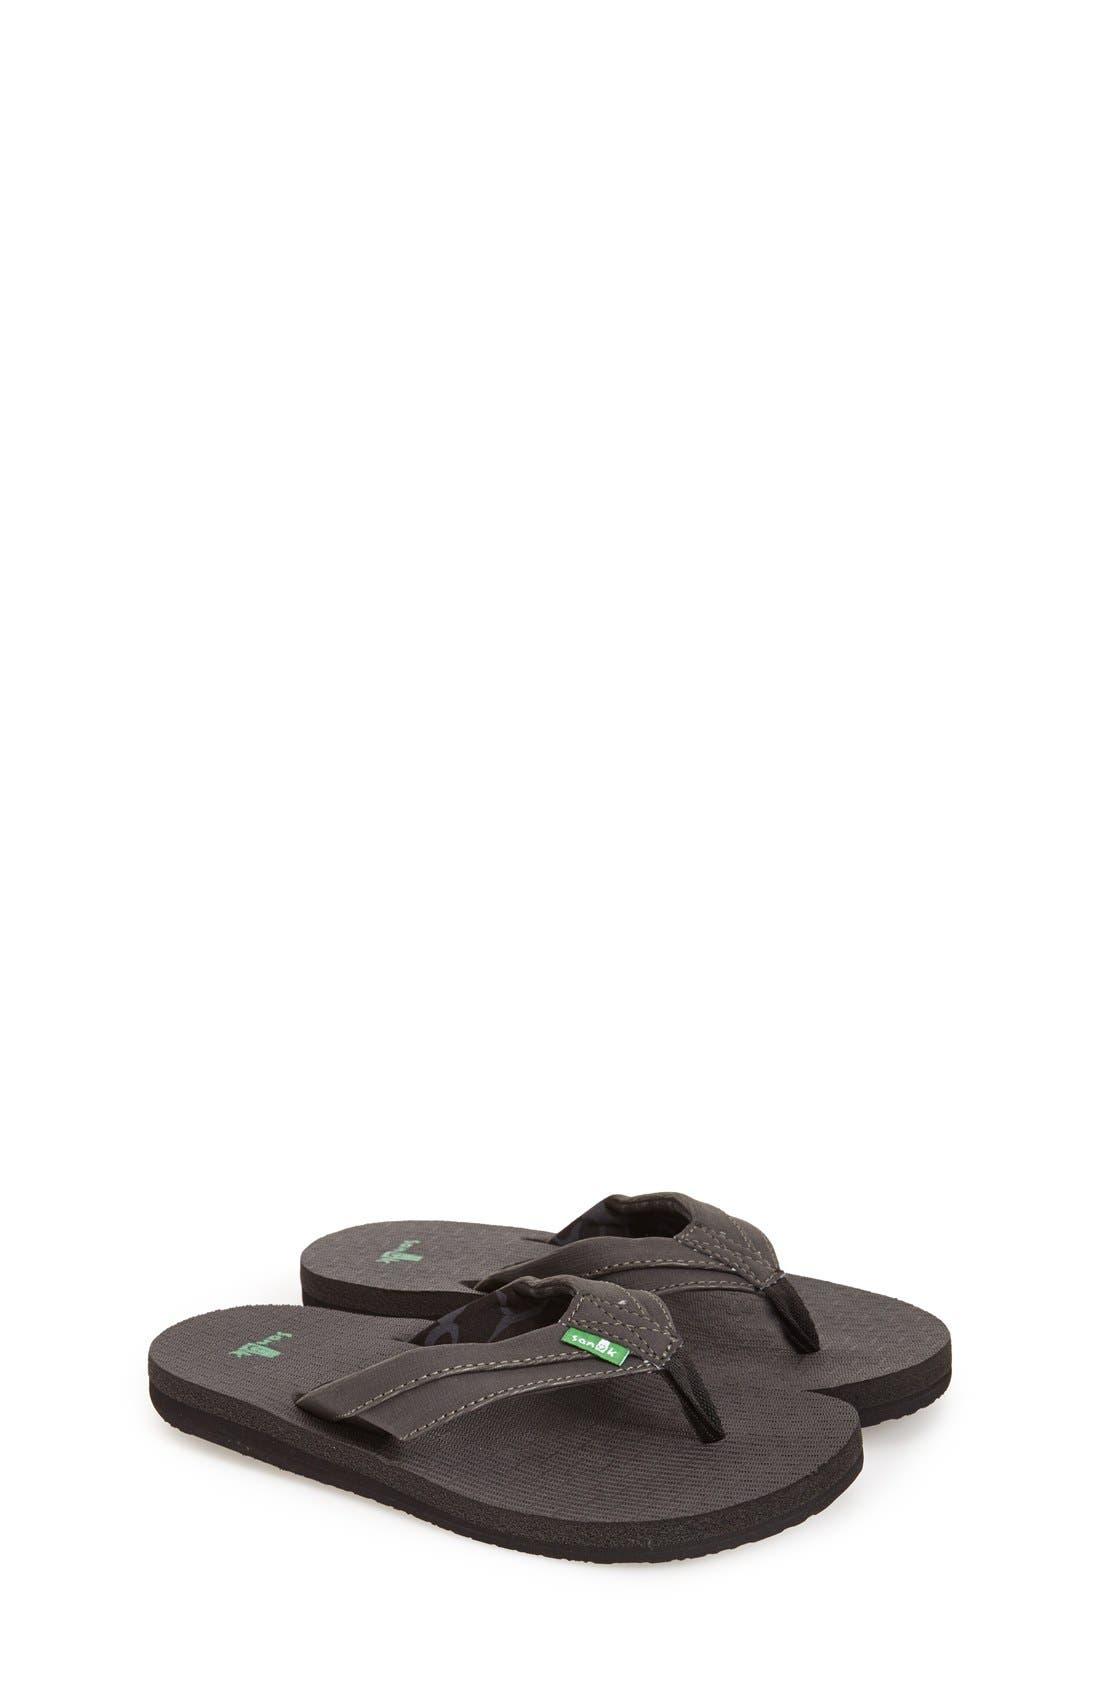 'Rootbeer Cozy' Lightweight Flip Flop Sandal,                             Main thumbnail 1, color,                             Black